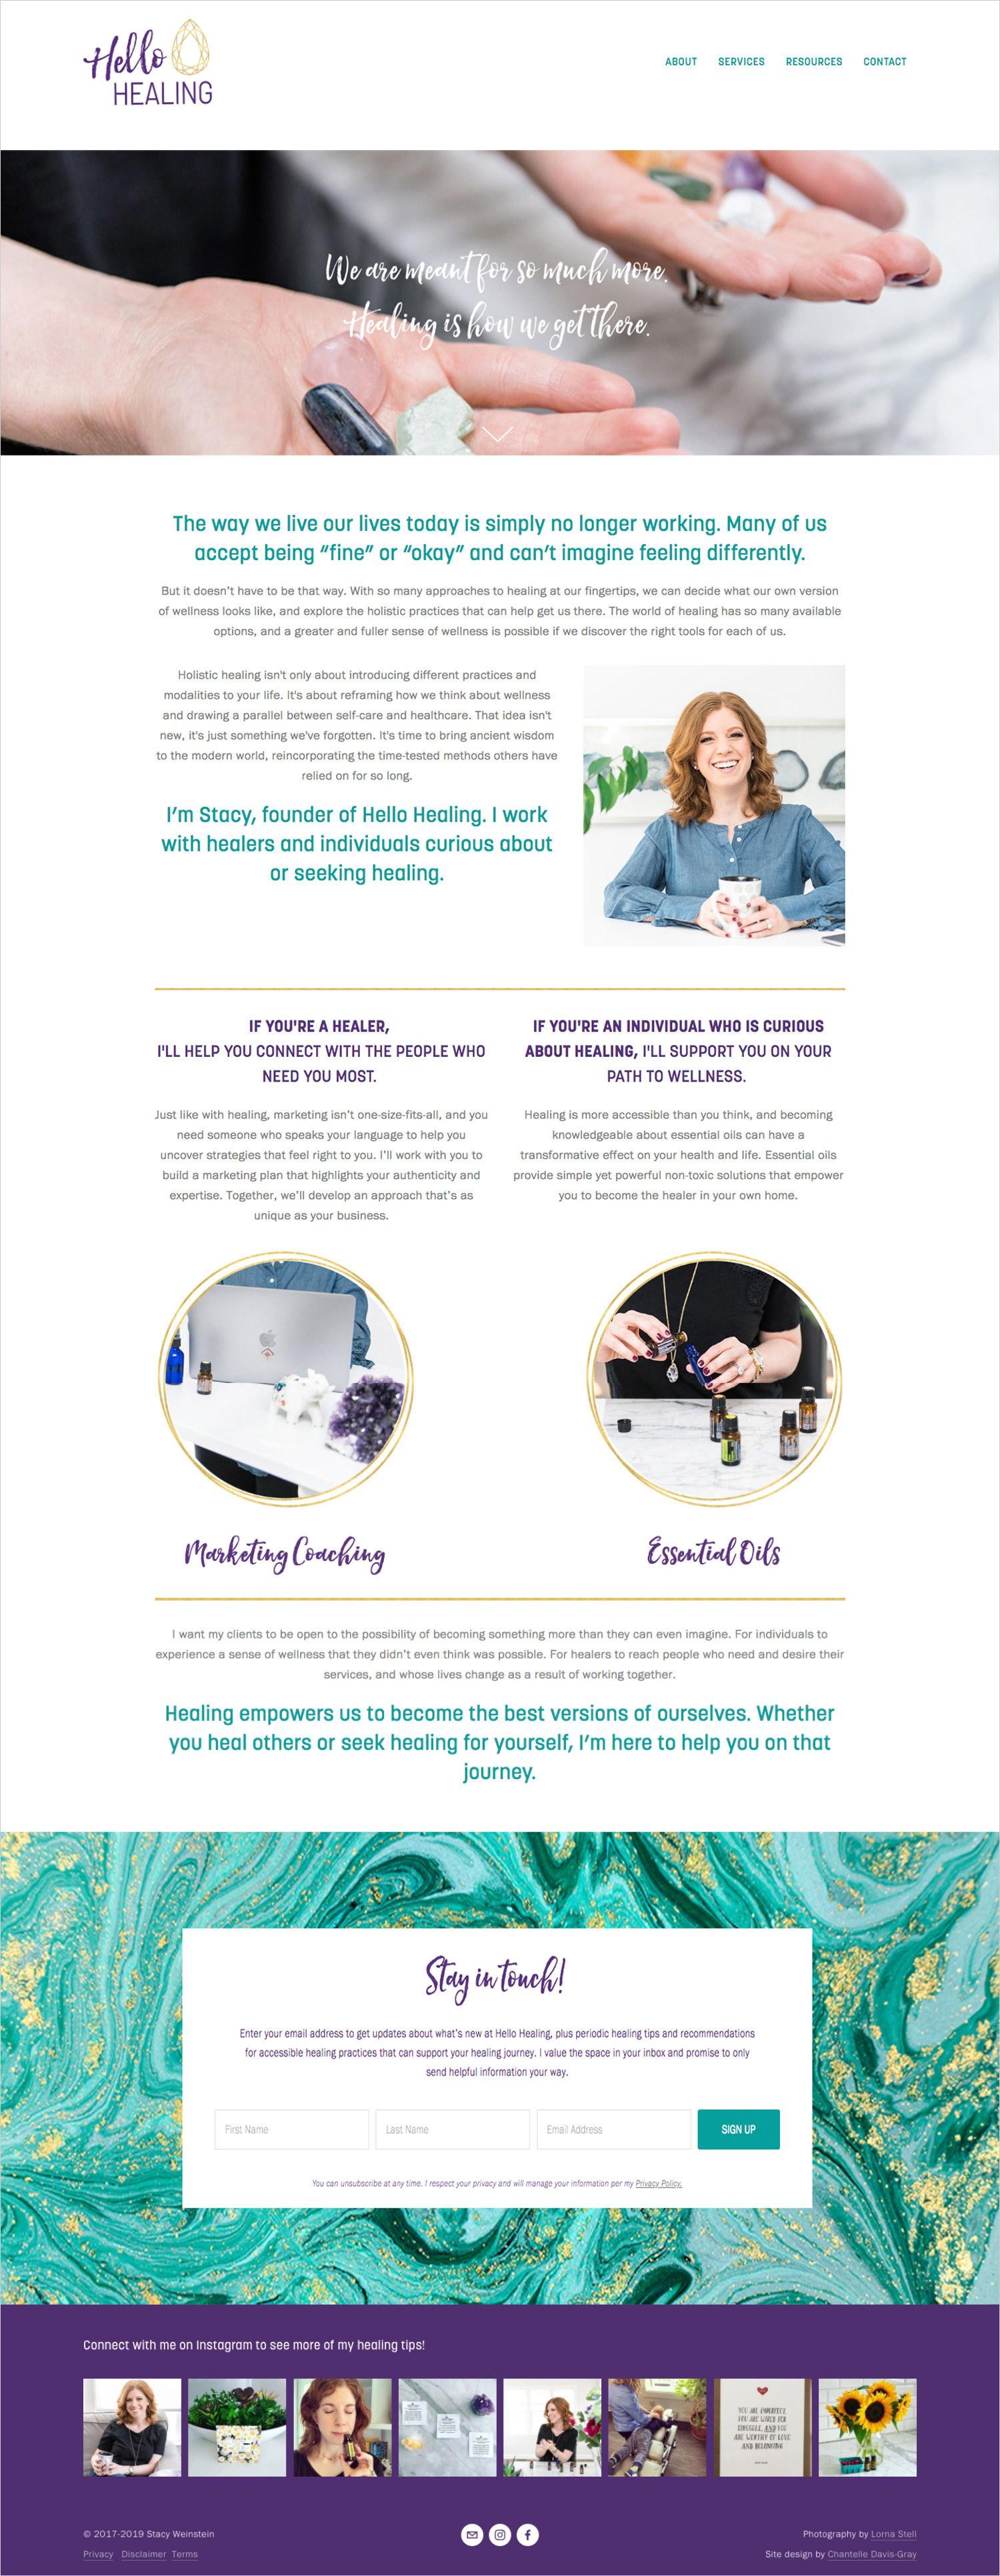 Essential oils and holistic health squarespace website and branding